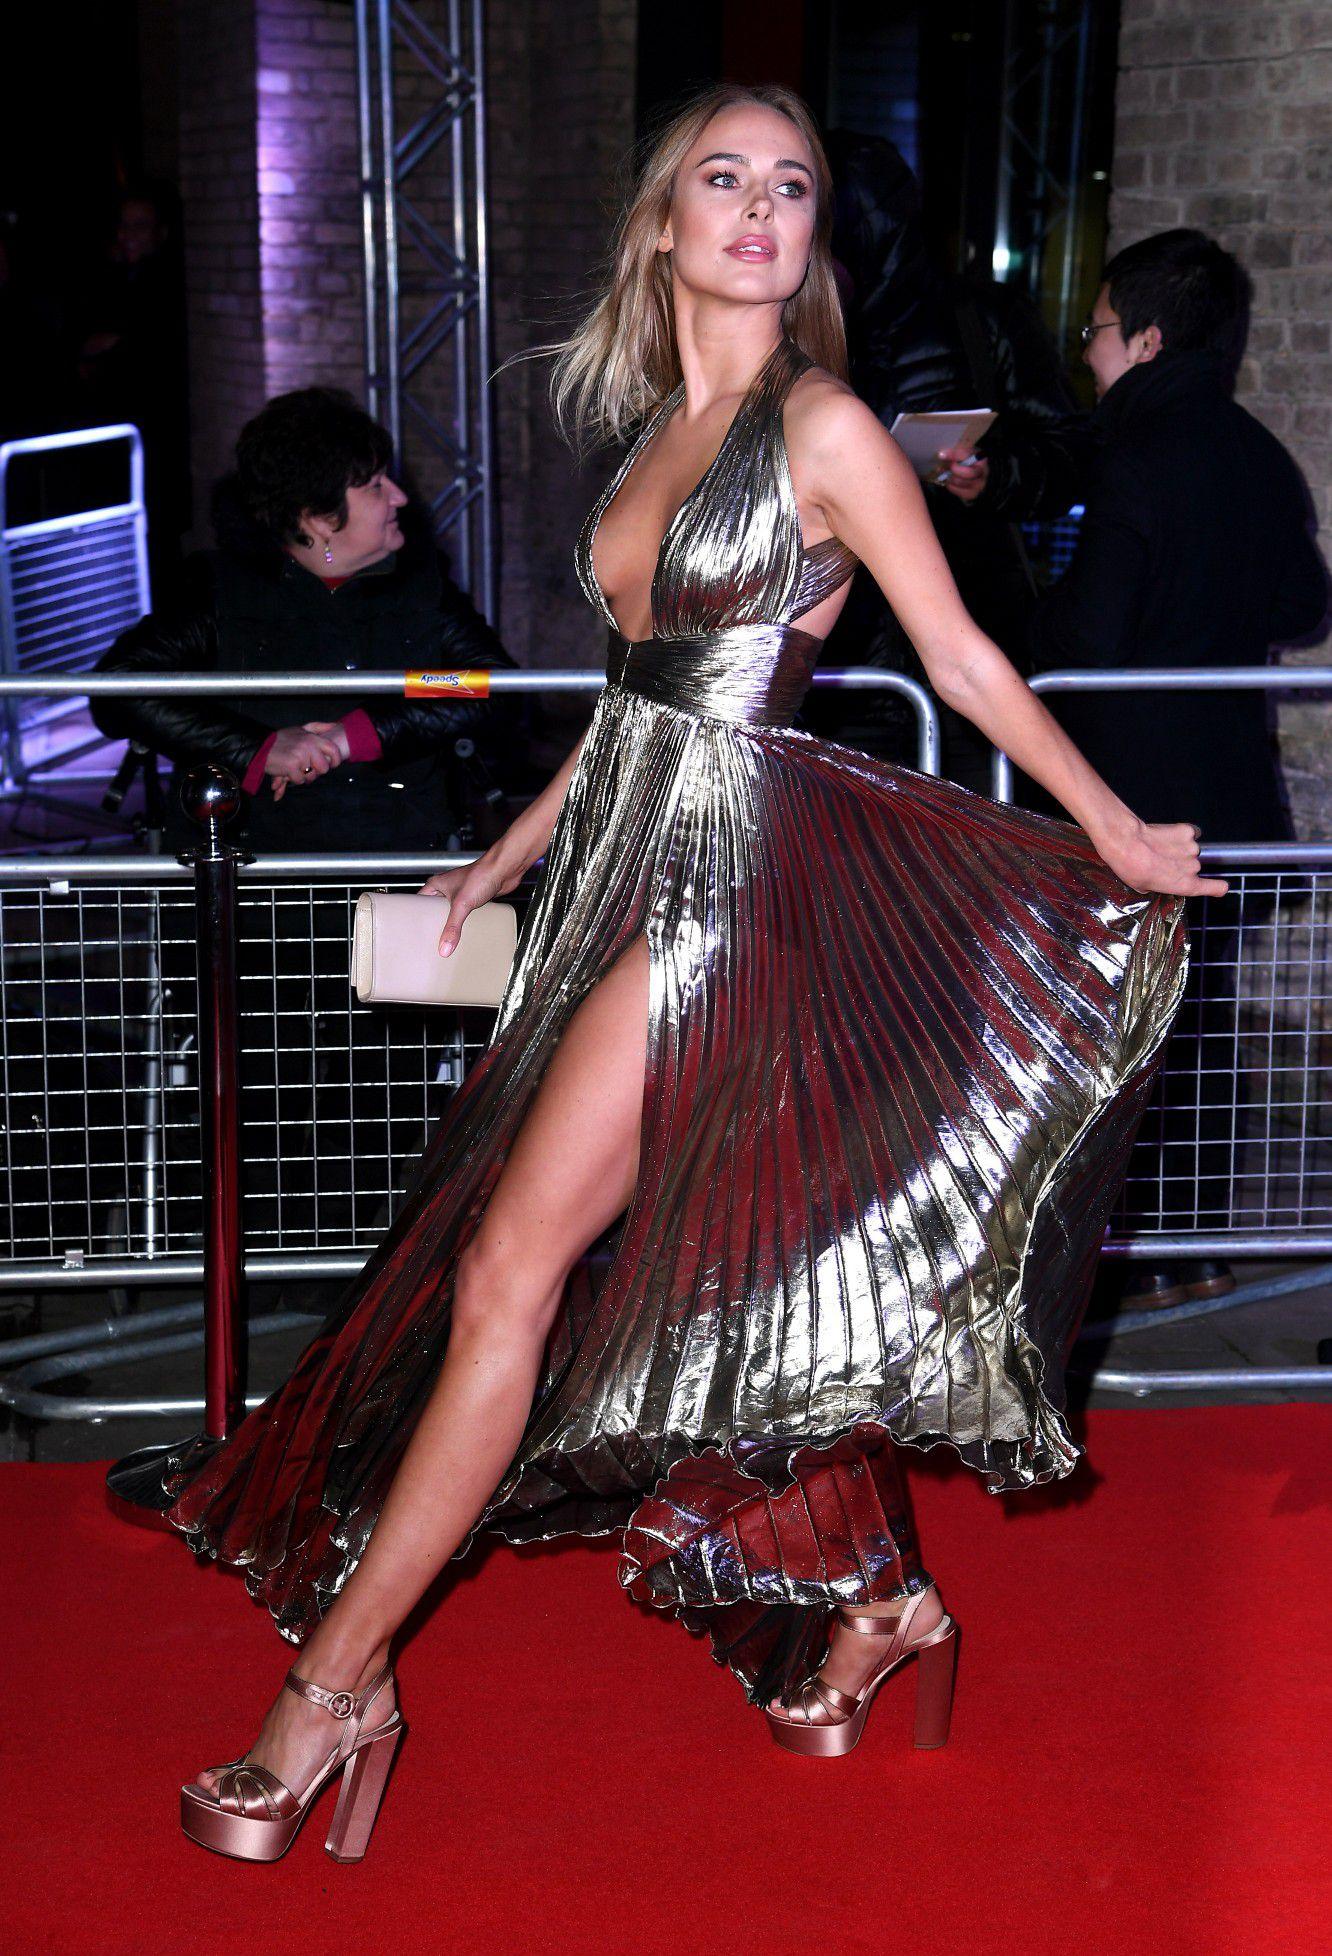 kimberley-garner-cleavage-at-fabulous-fund-fair-in-london-5068